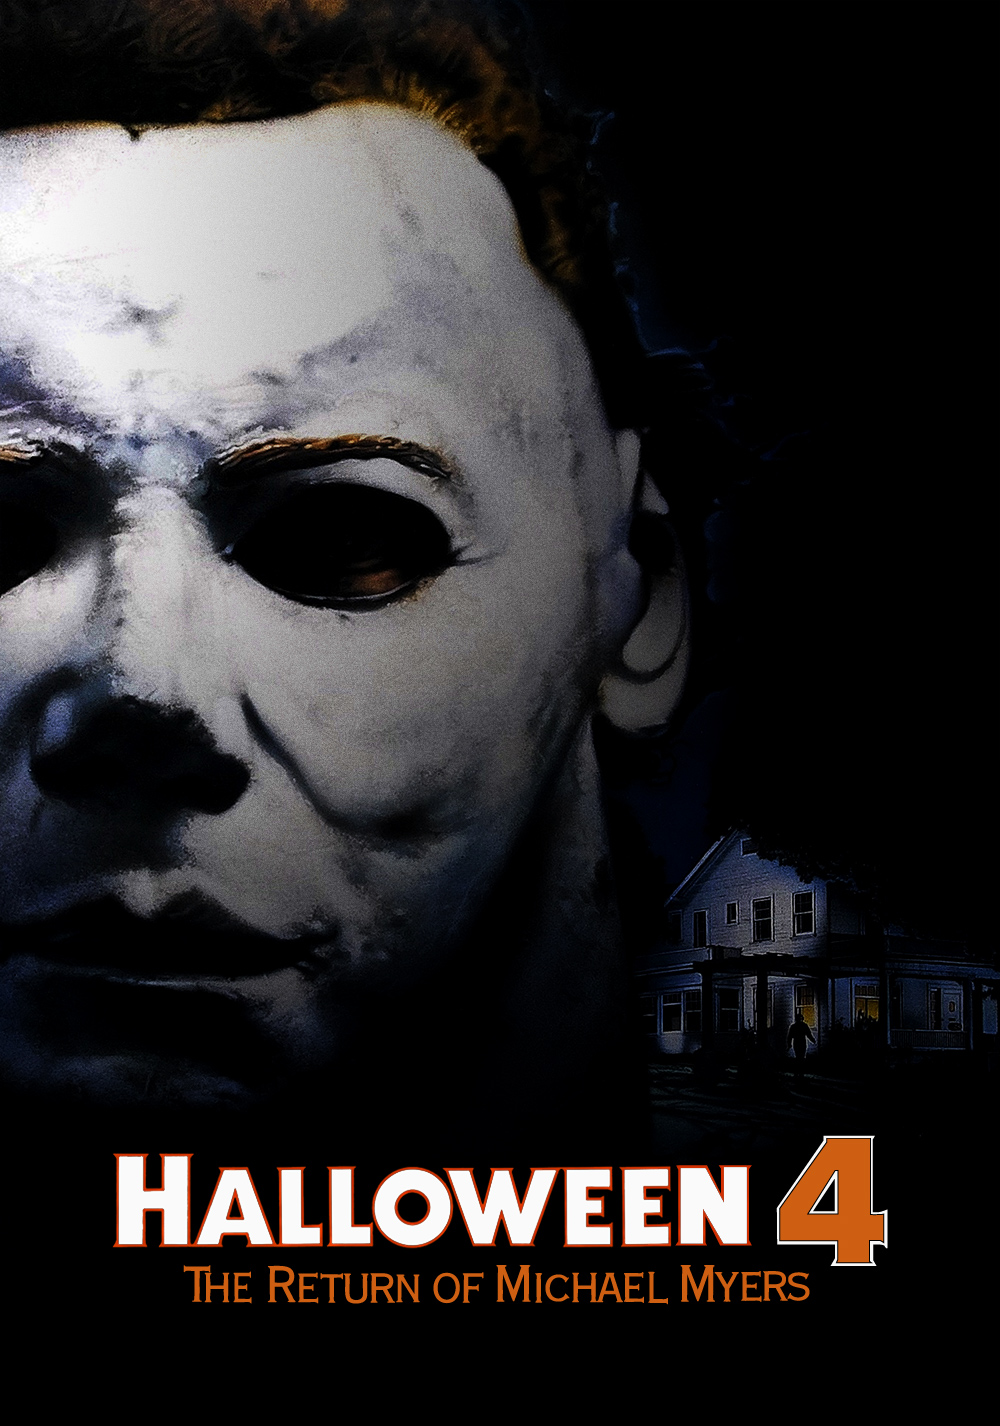 Halloween 4: The Return of Michael Myers | Movie fanart ...